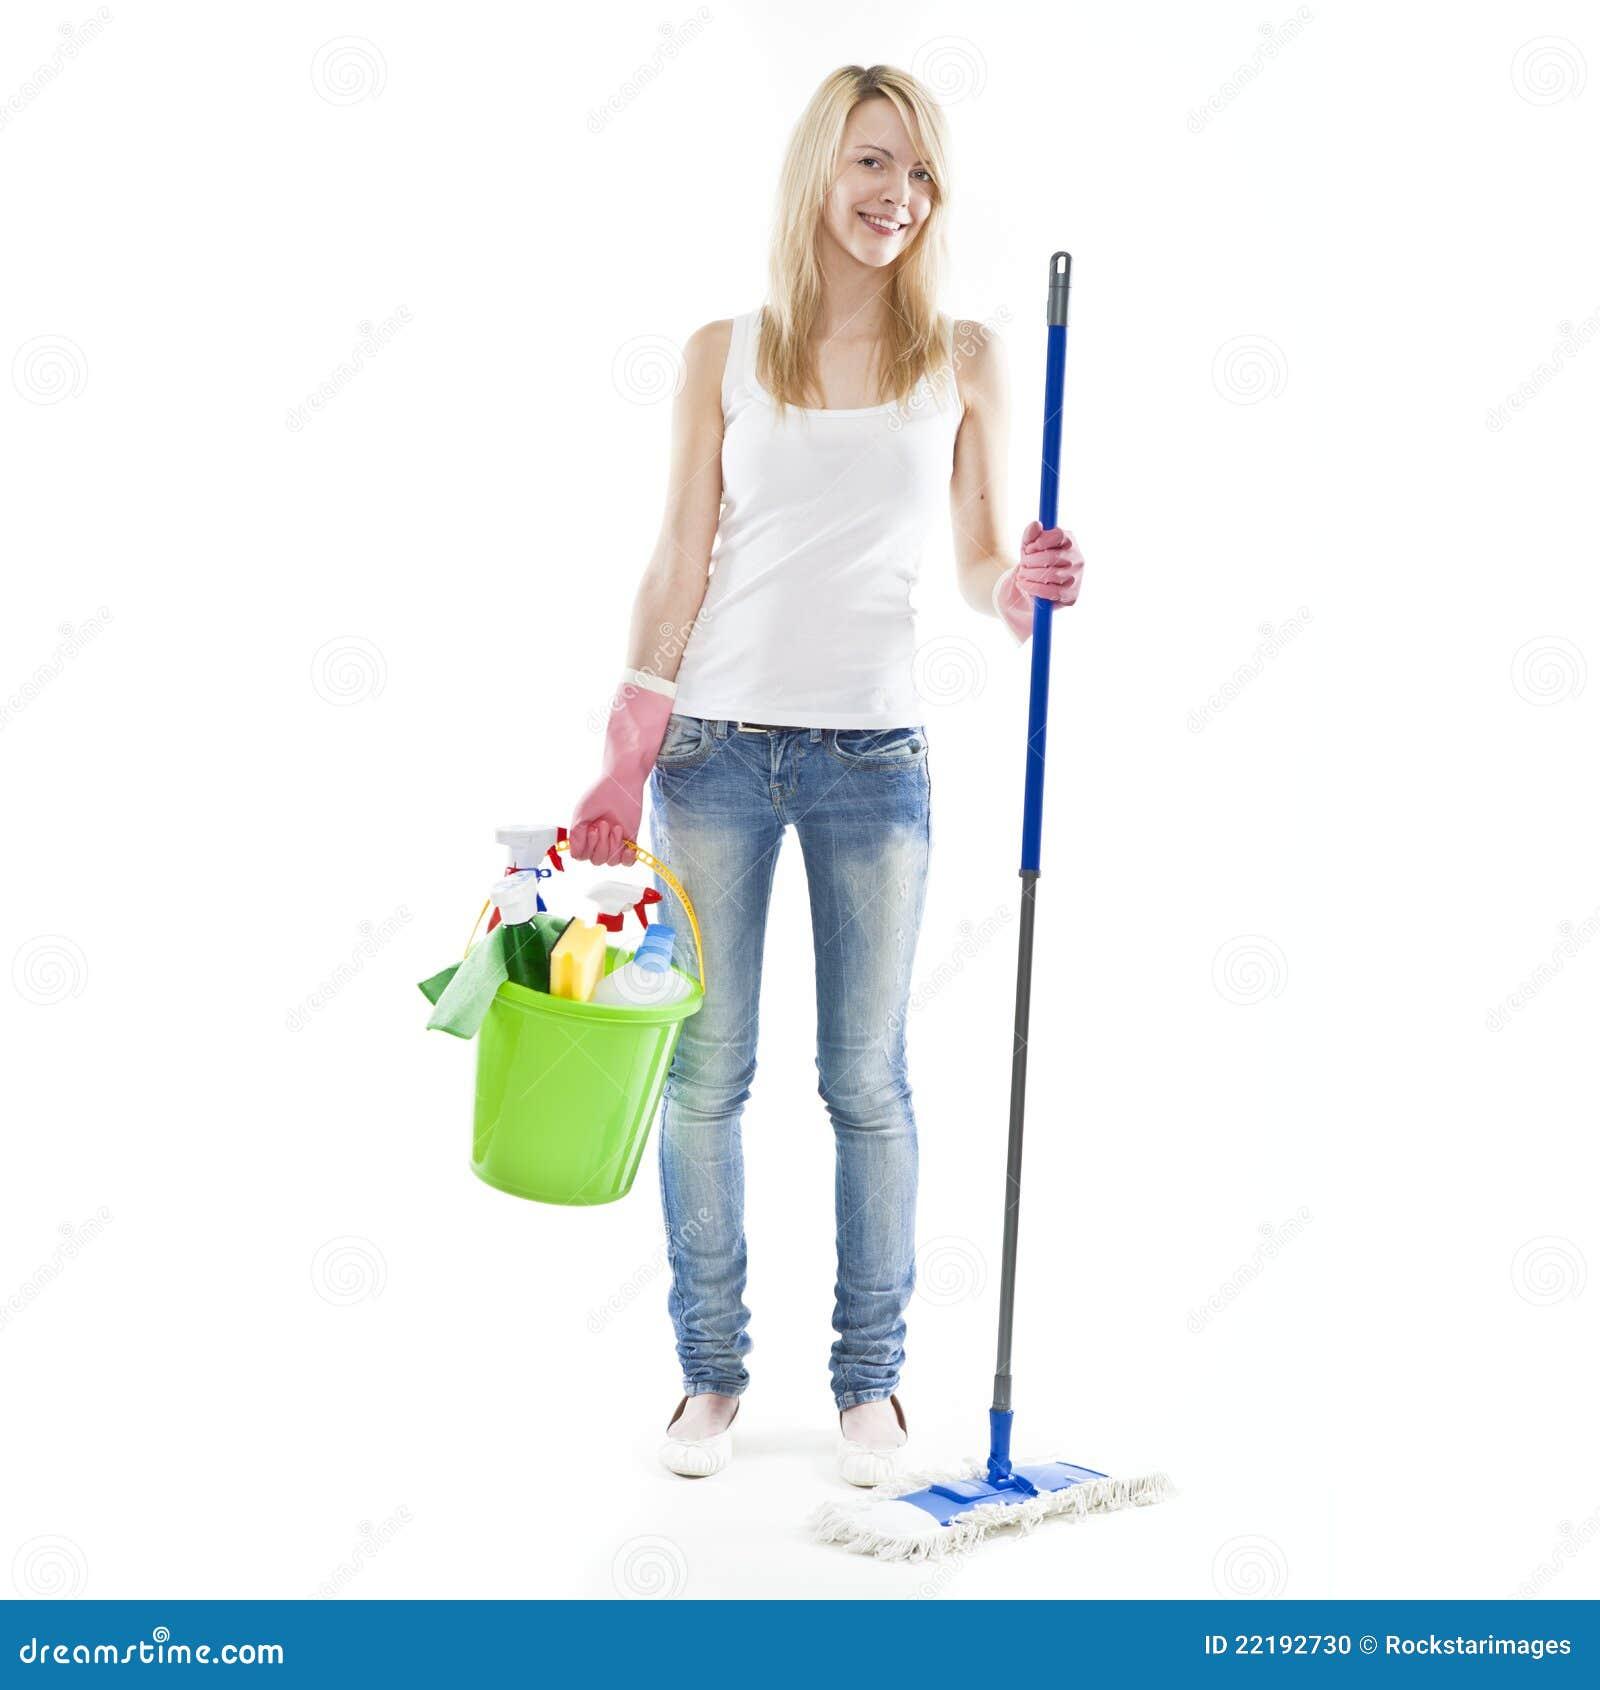 junge blonde attraktive haus putzende frau stockfoto bild 22192730. Black Bedroom Furniture Sets. Home Design Ideas